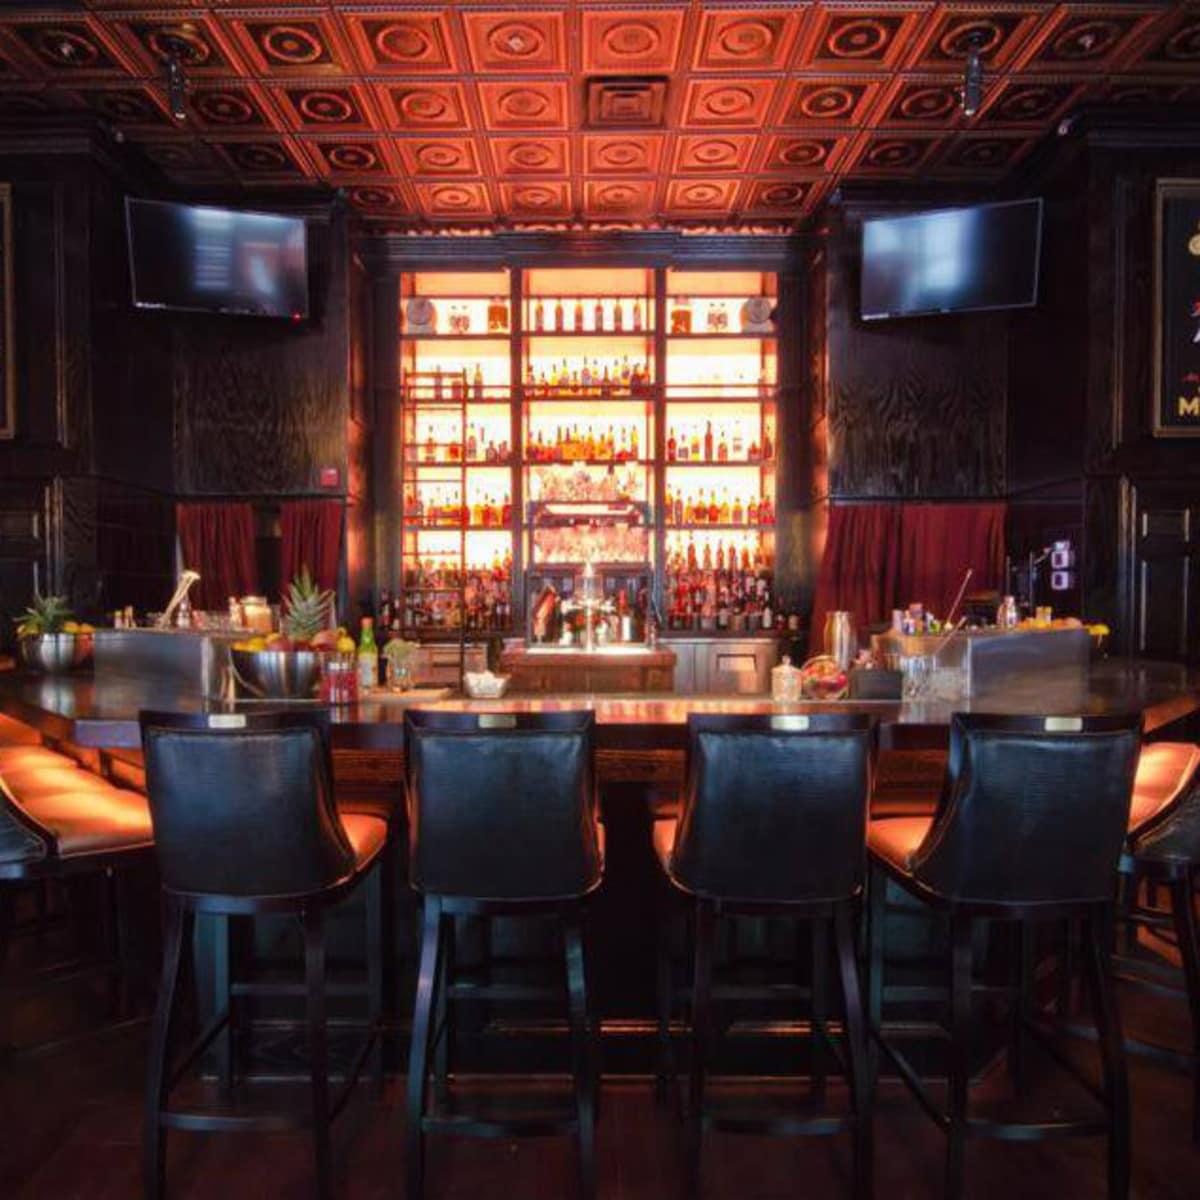 Parliament bar in Dallas